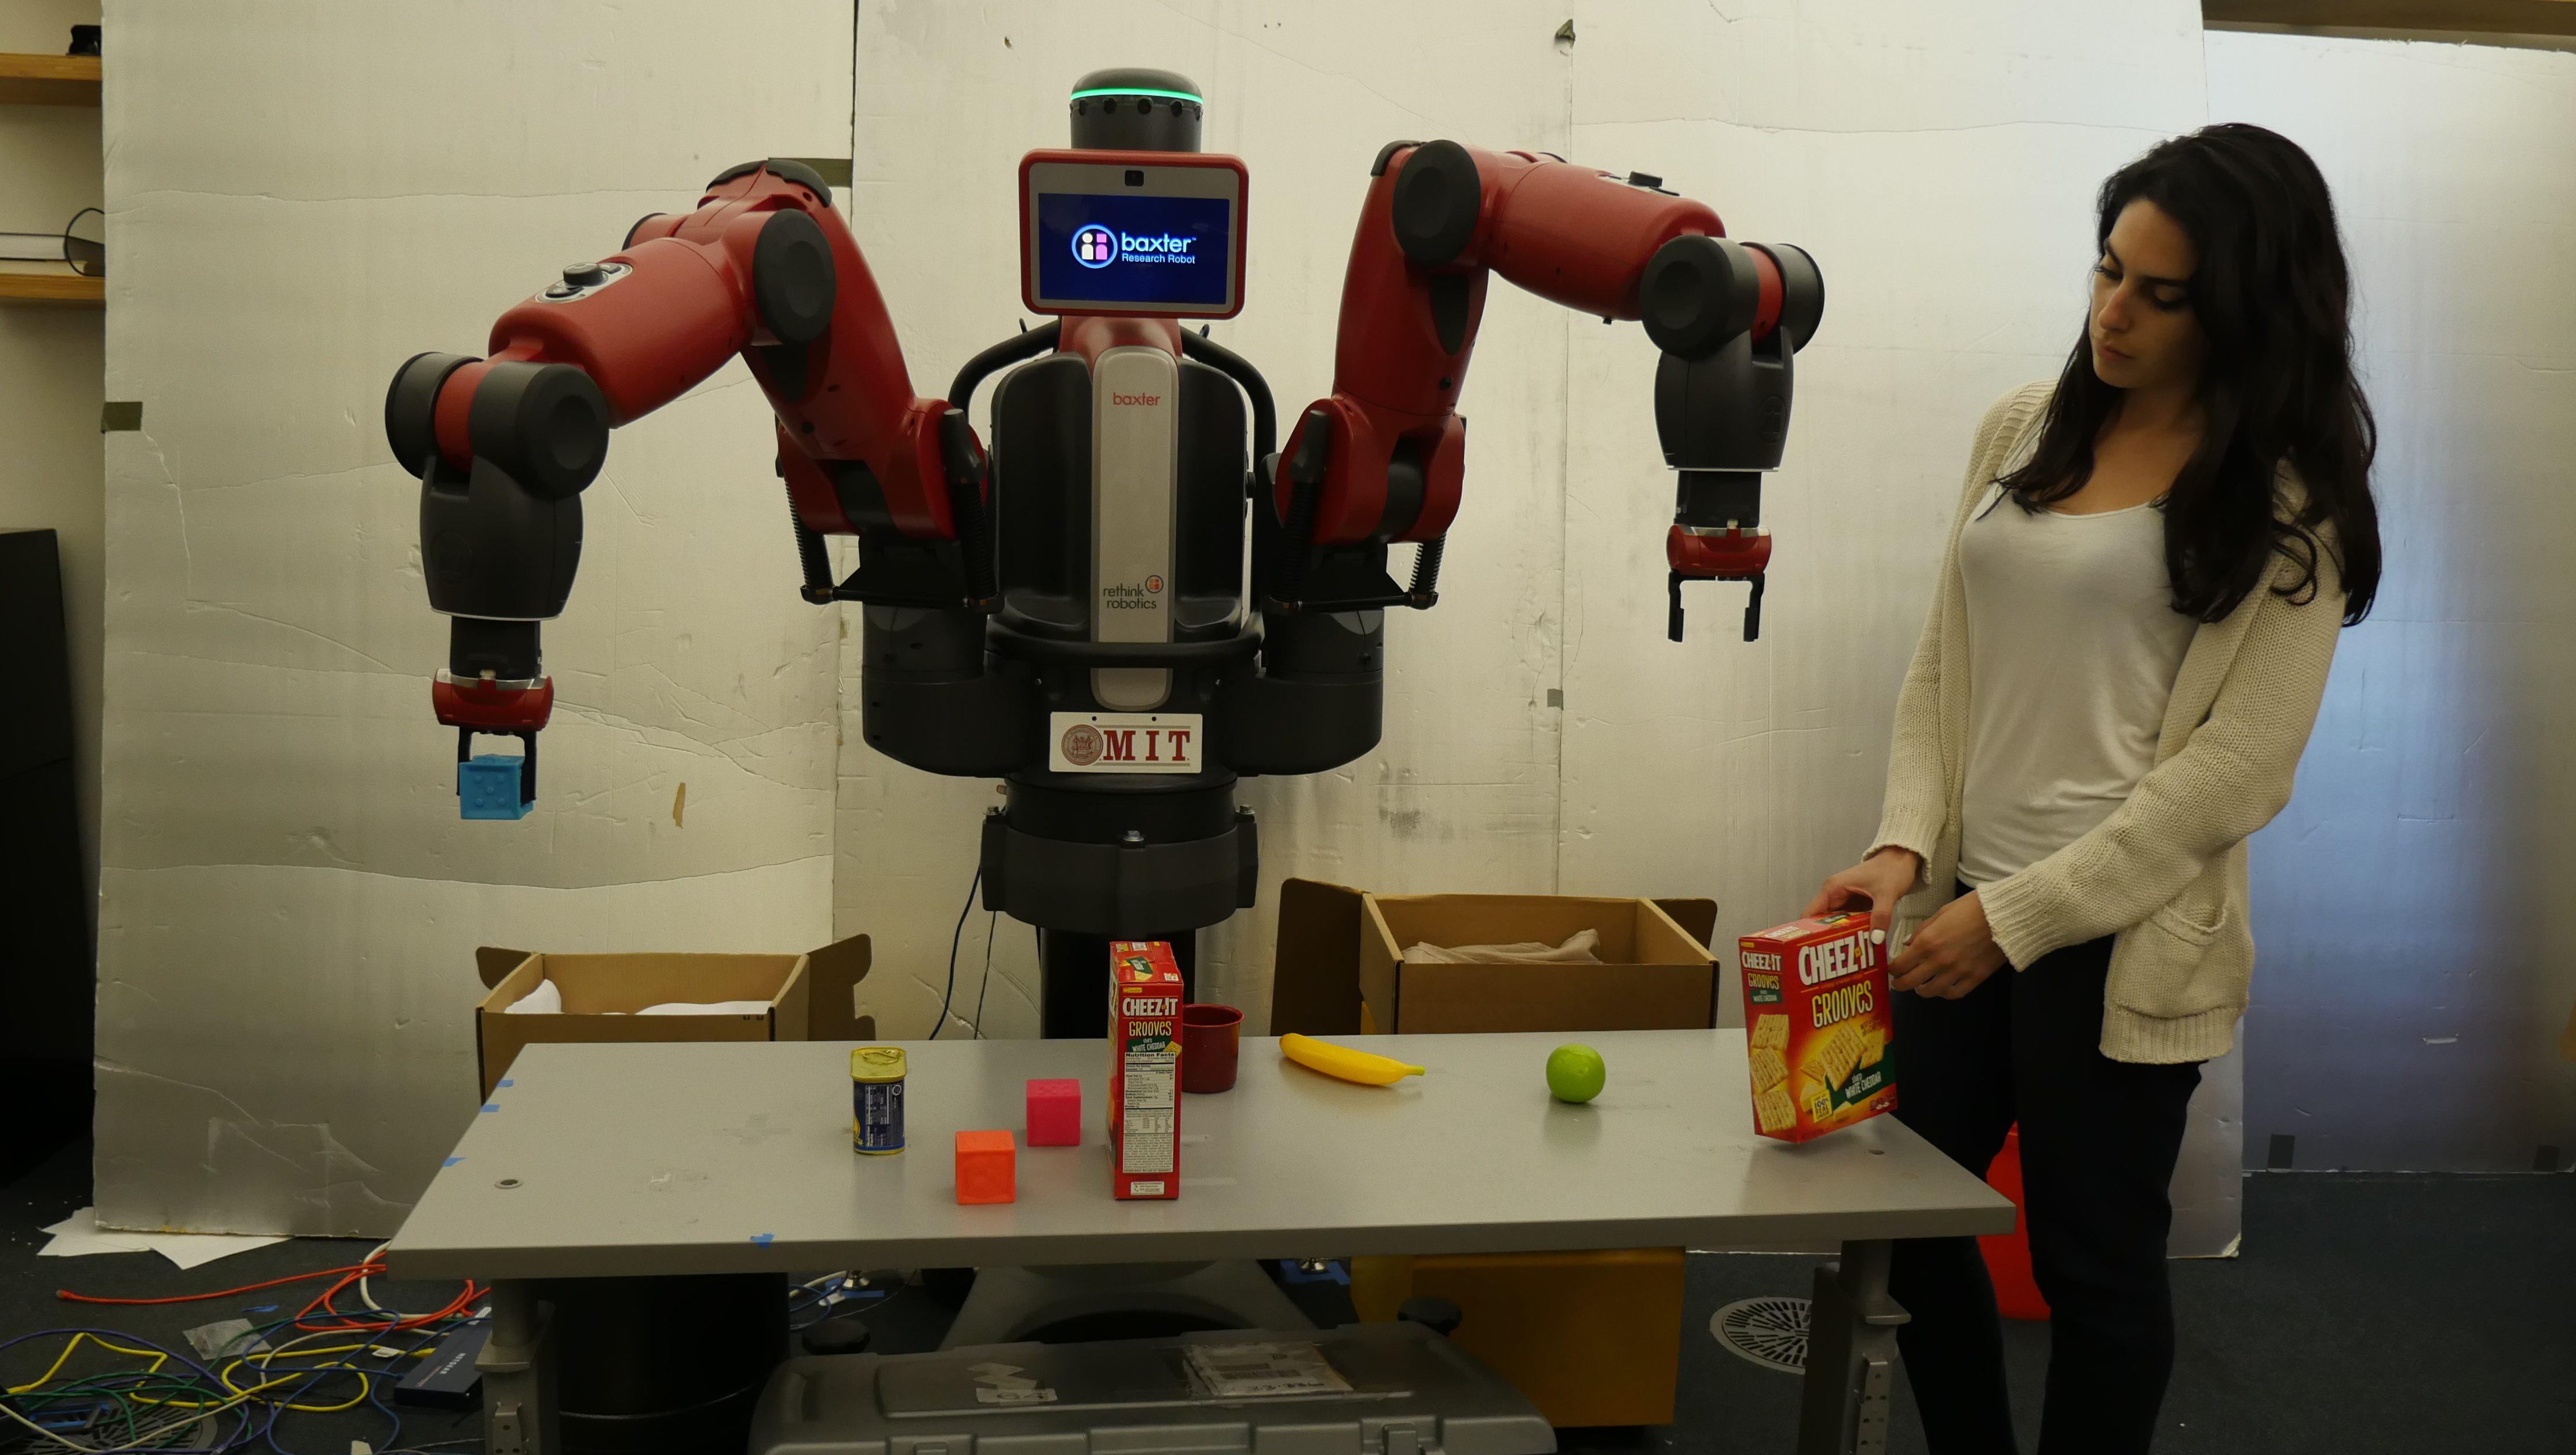 Baxter Echo robot Amazon MIT